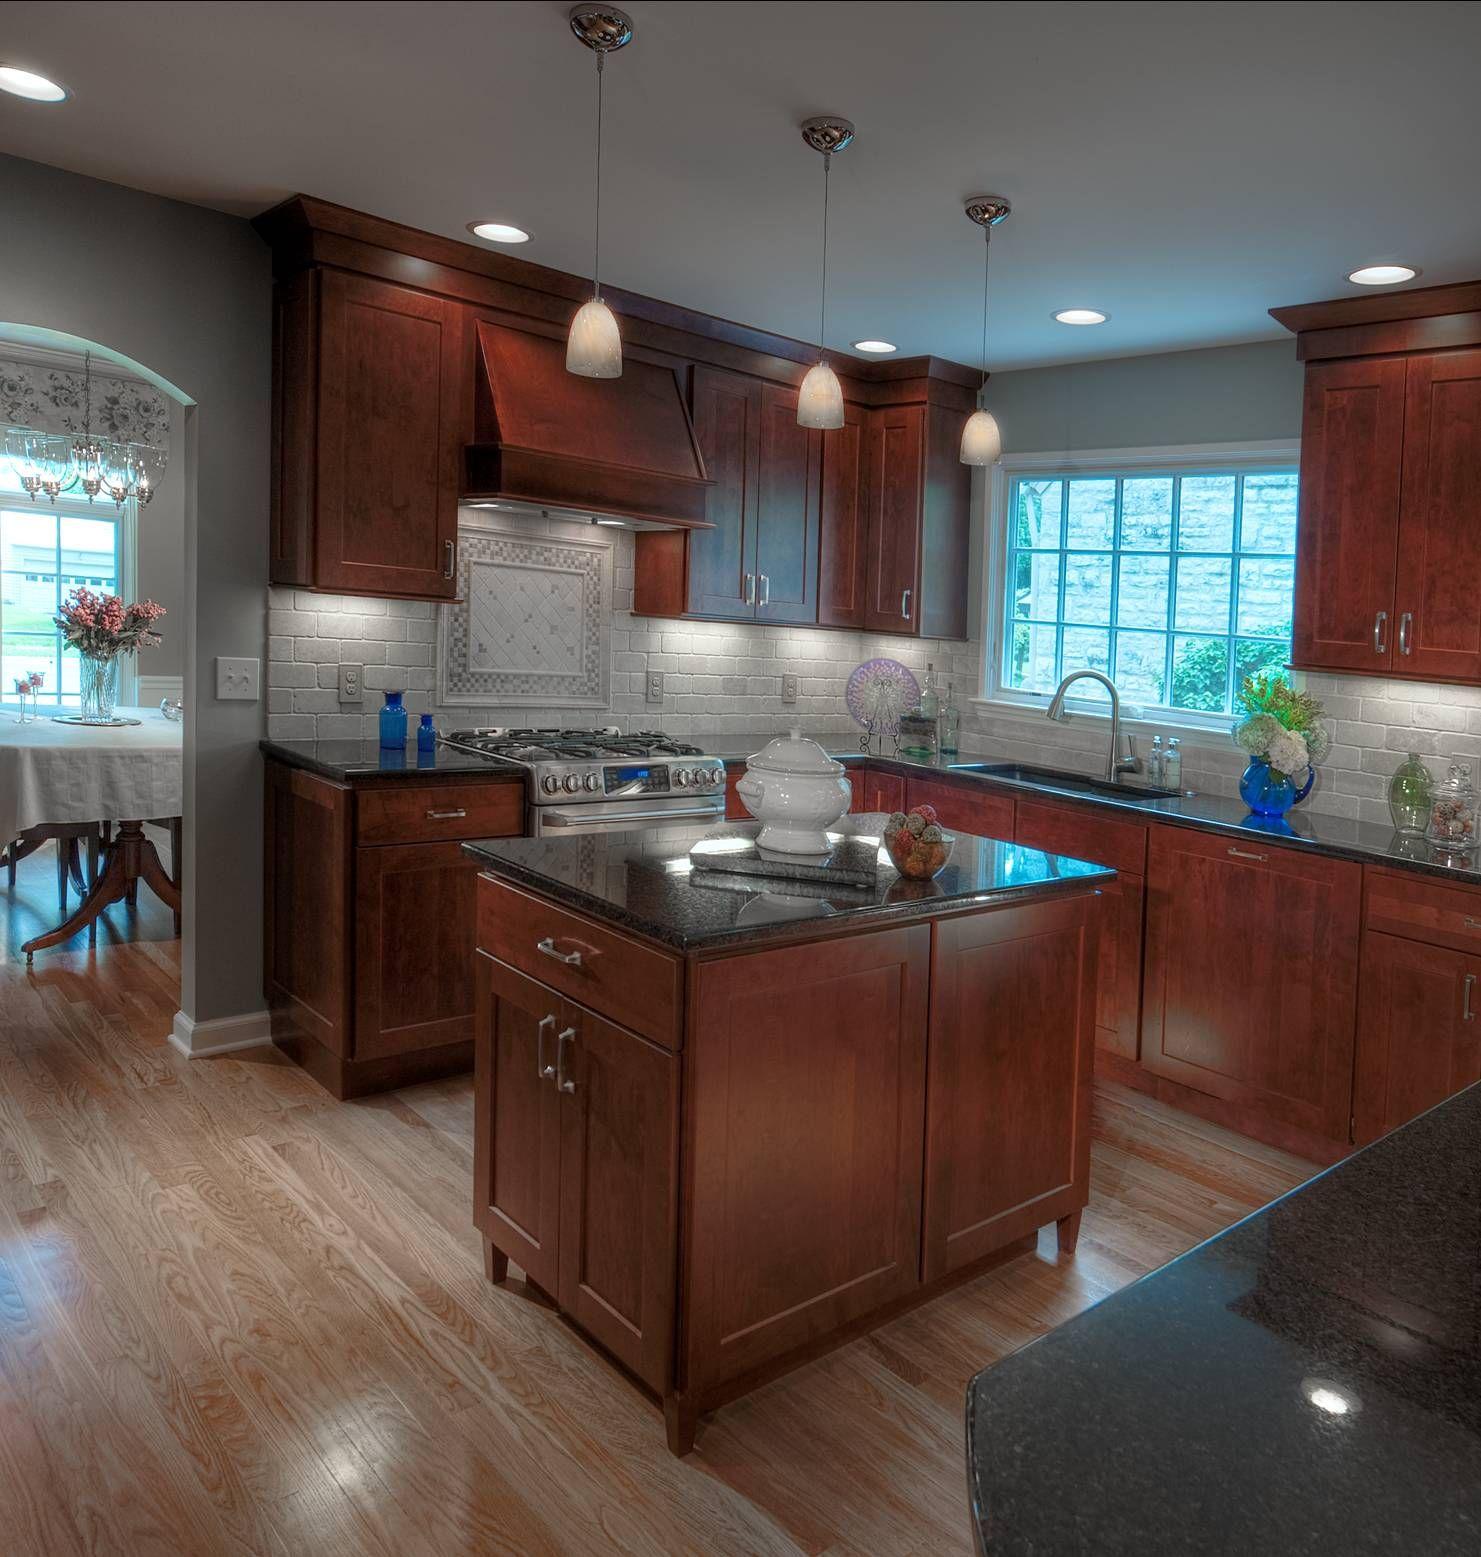 Dark Maple Cabinets, Black Granite Tops And Travertine